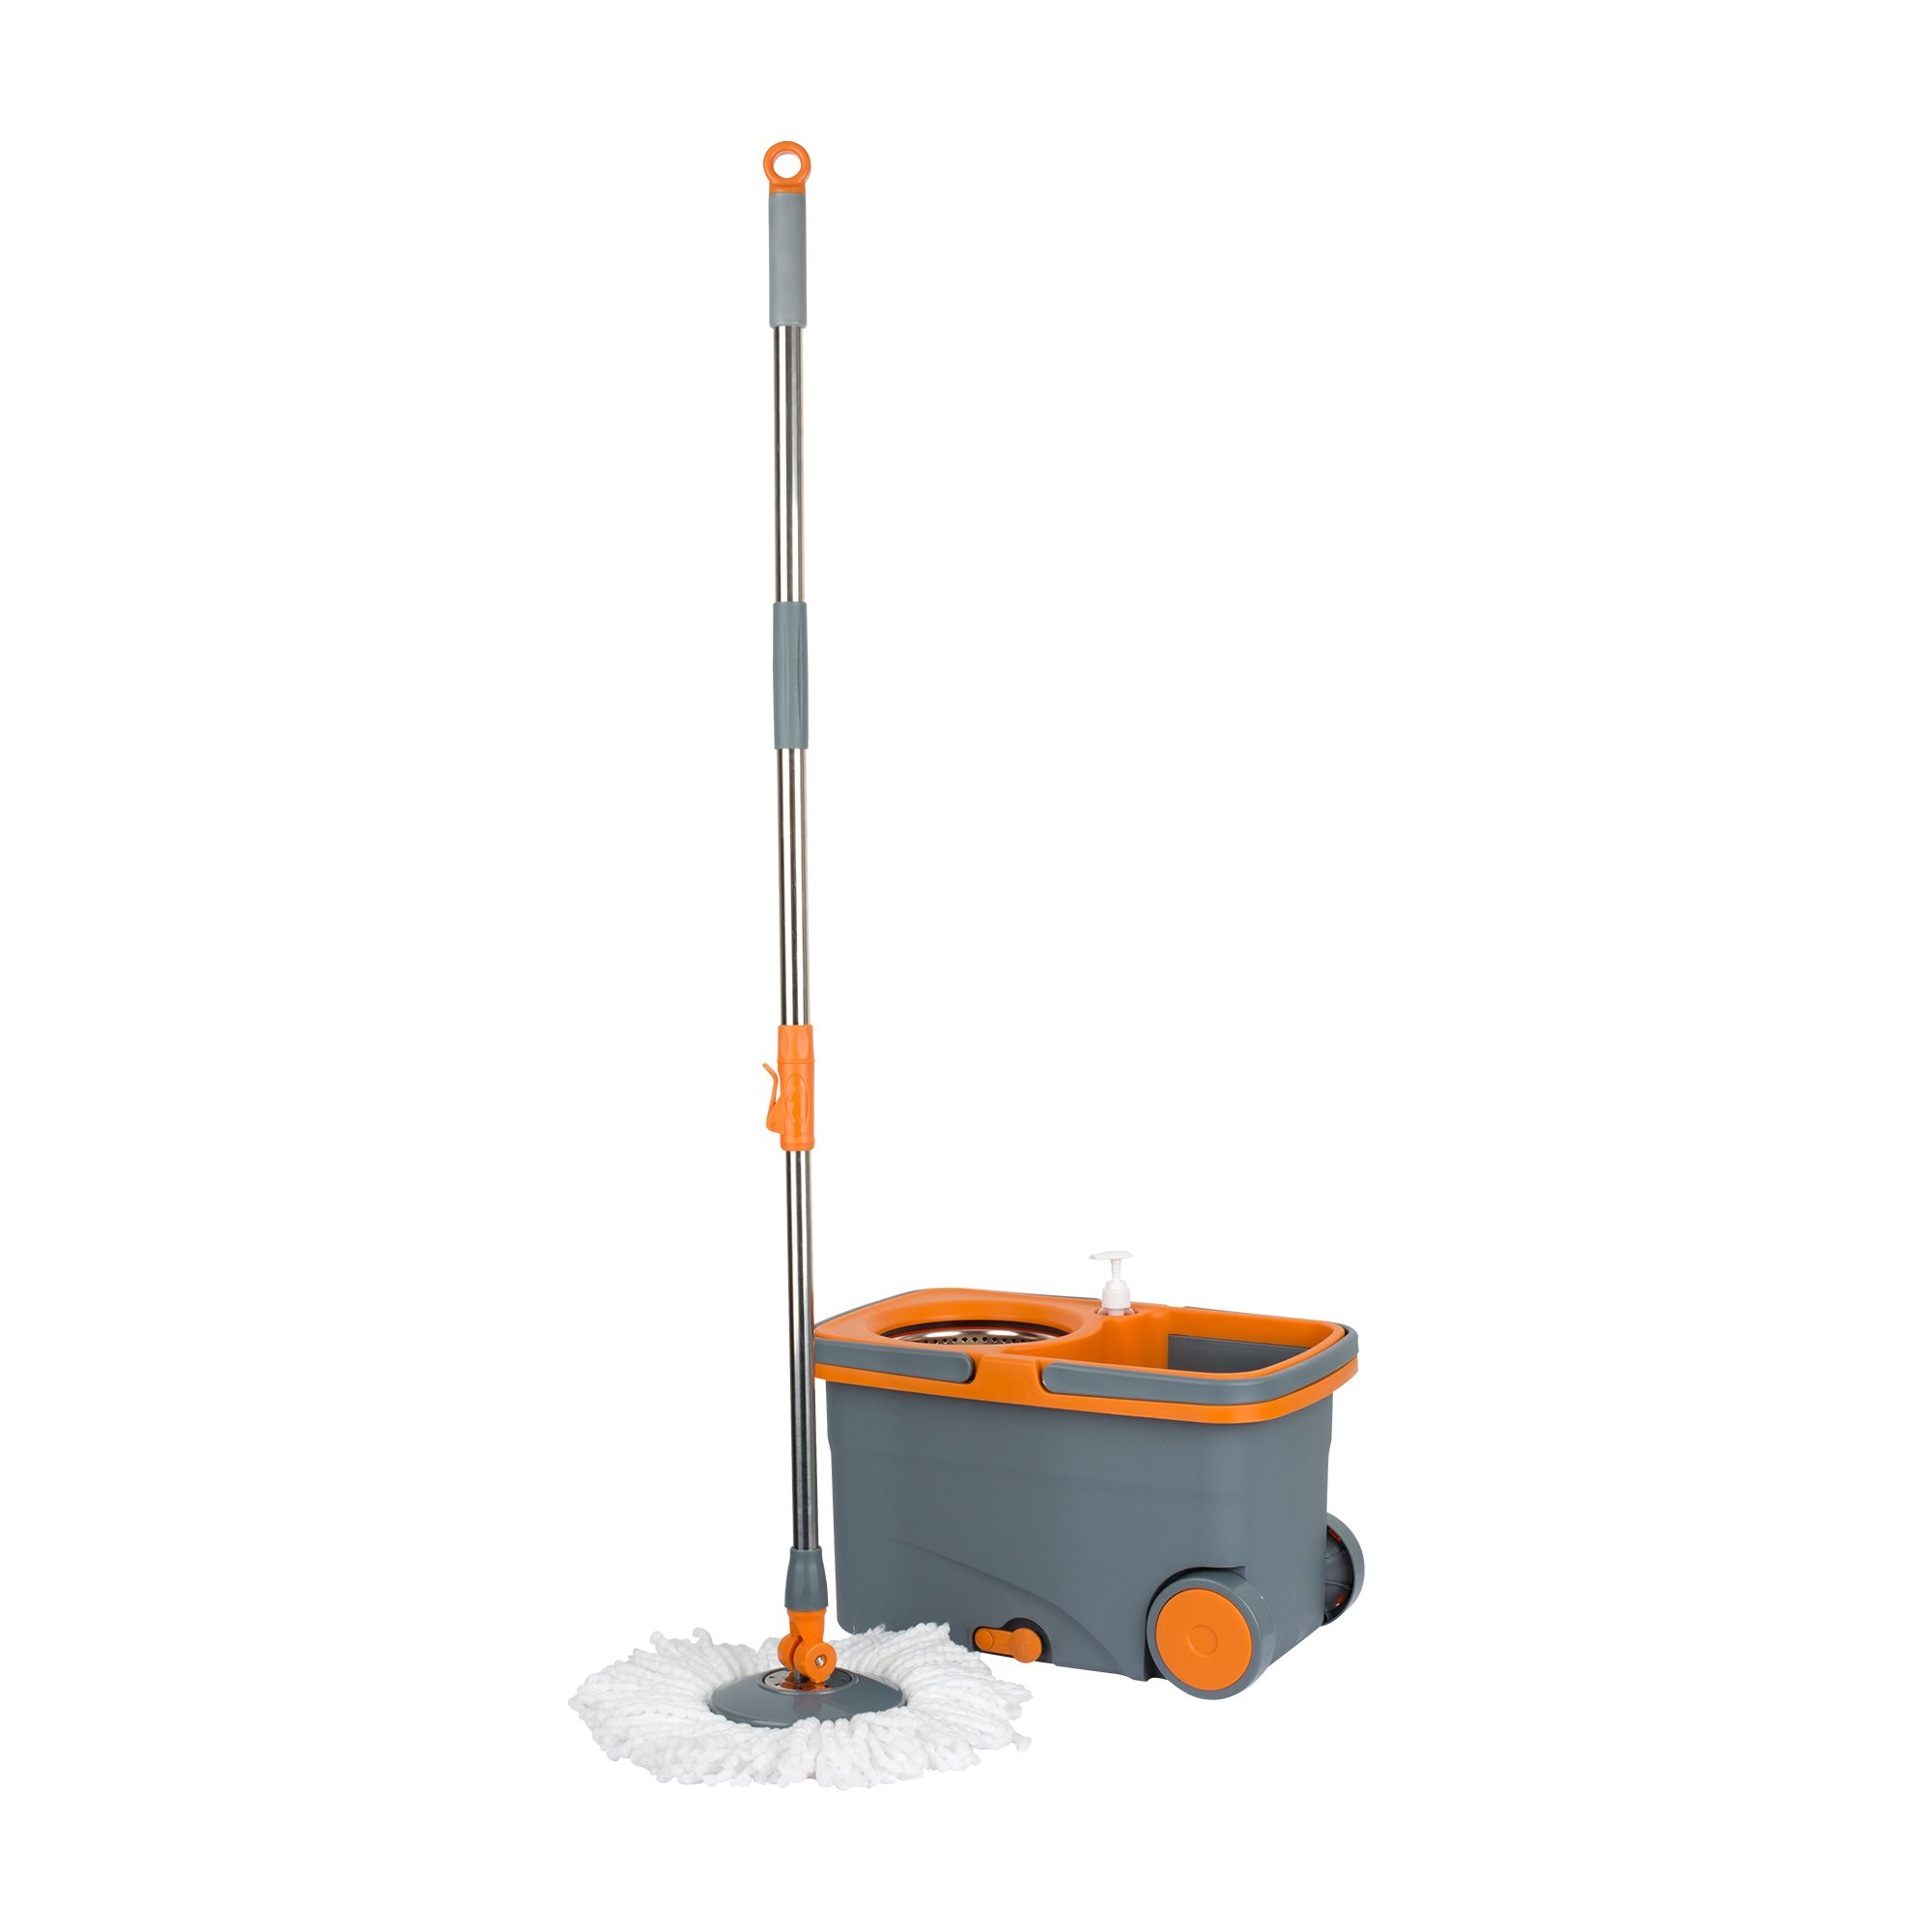 Casabella Spin Cycle Mop with Bucket-Graphite/Orange